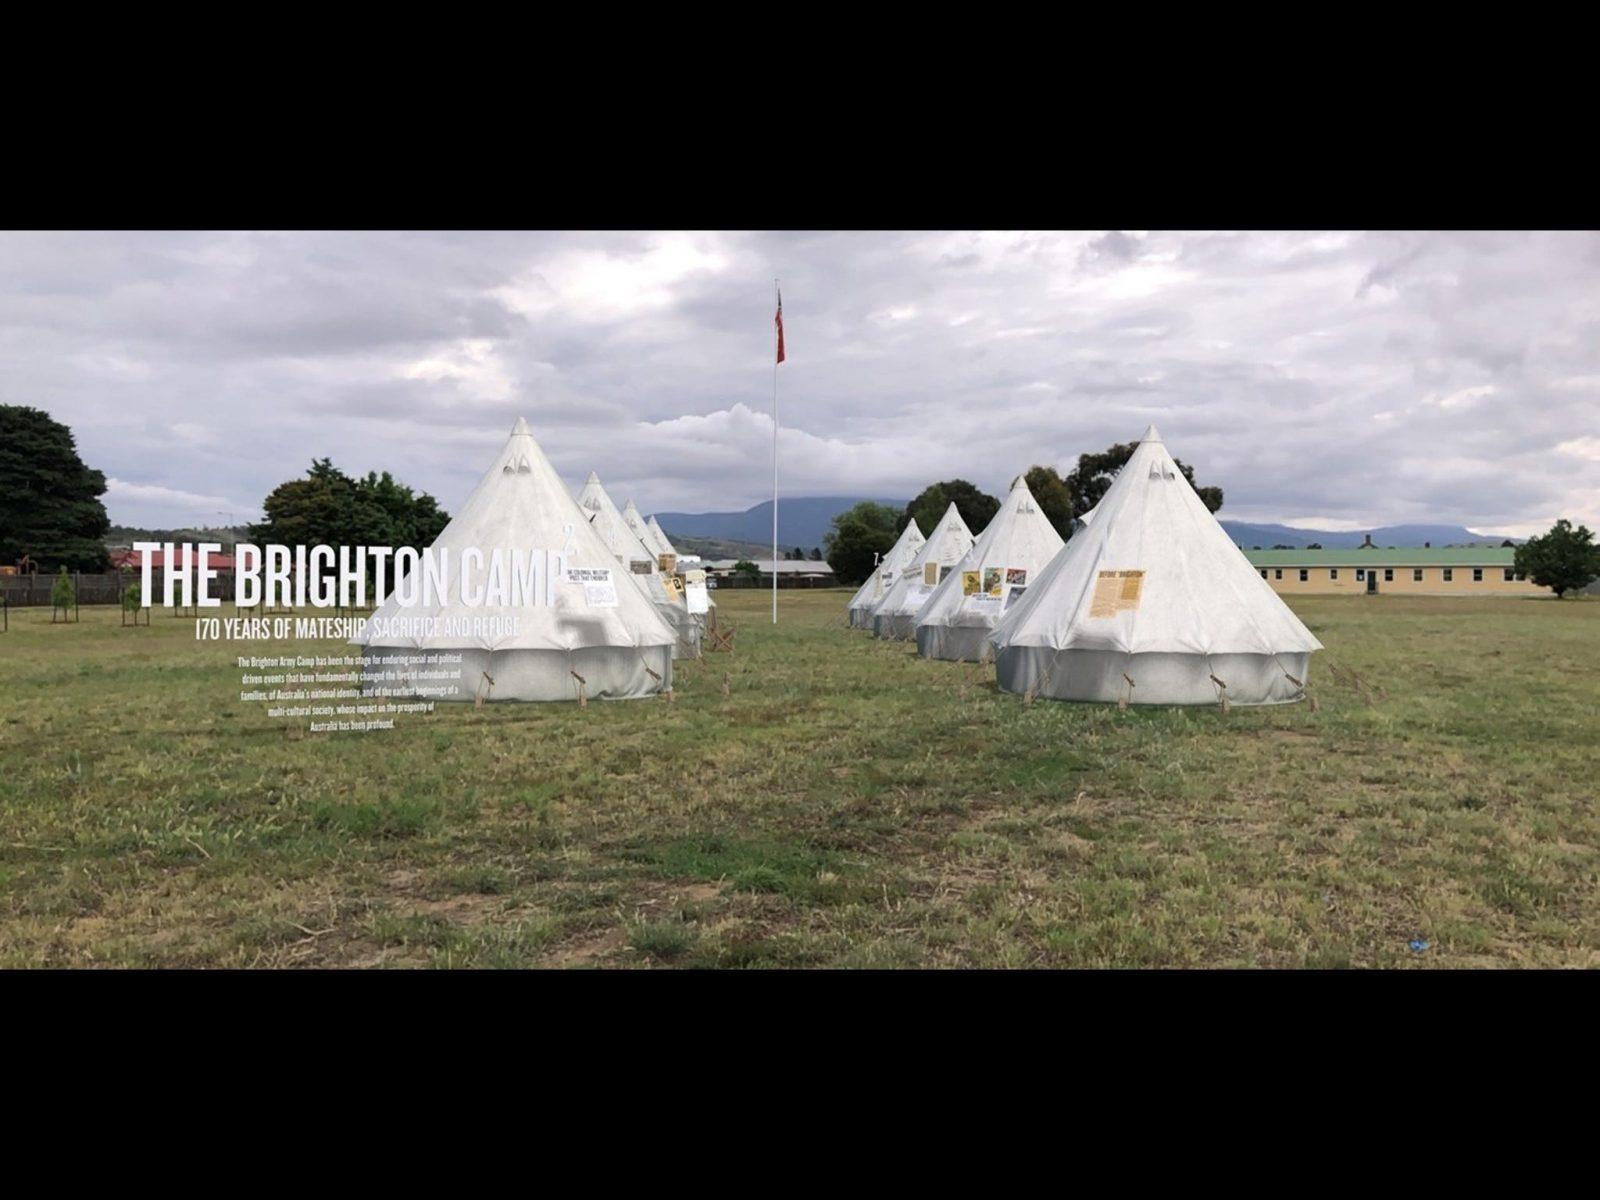 Brighton Army Camp